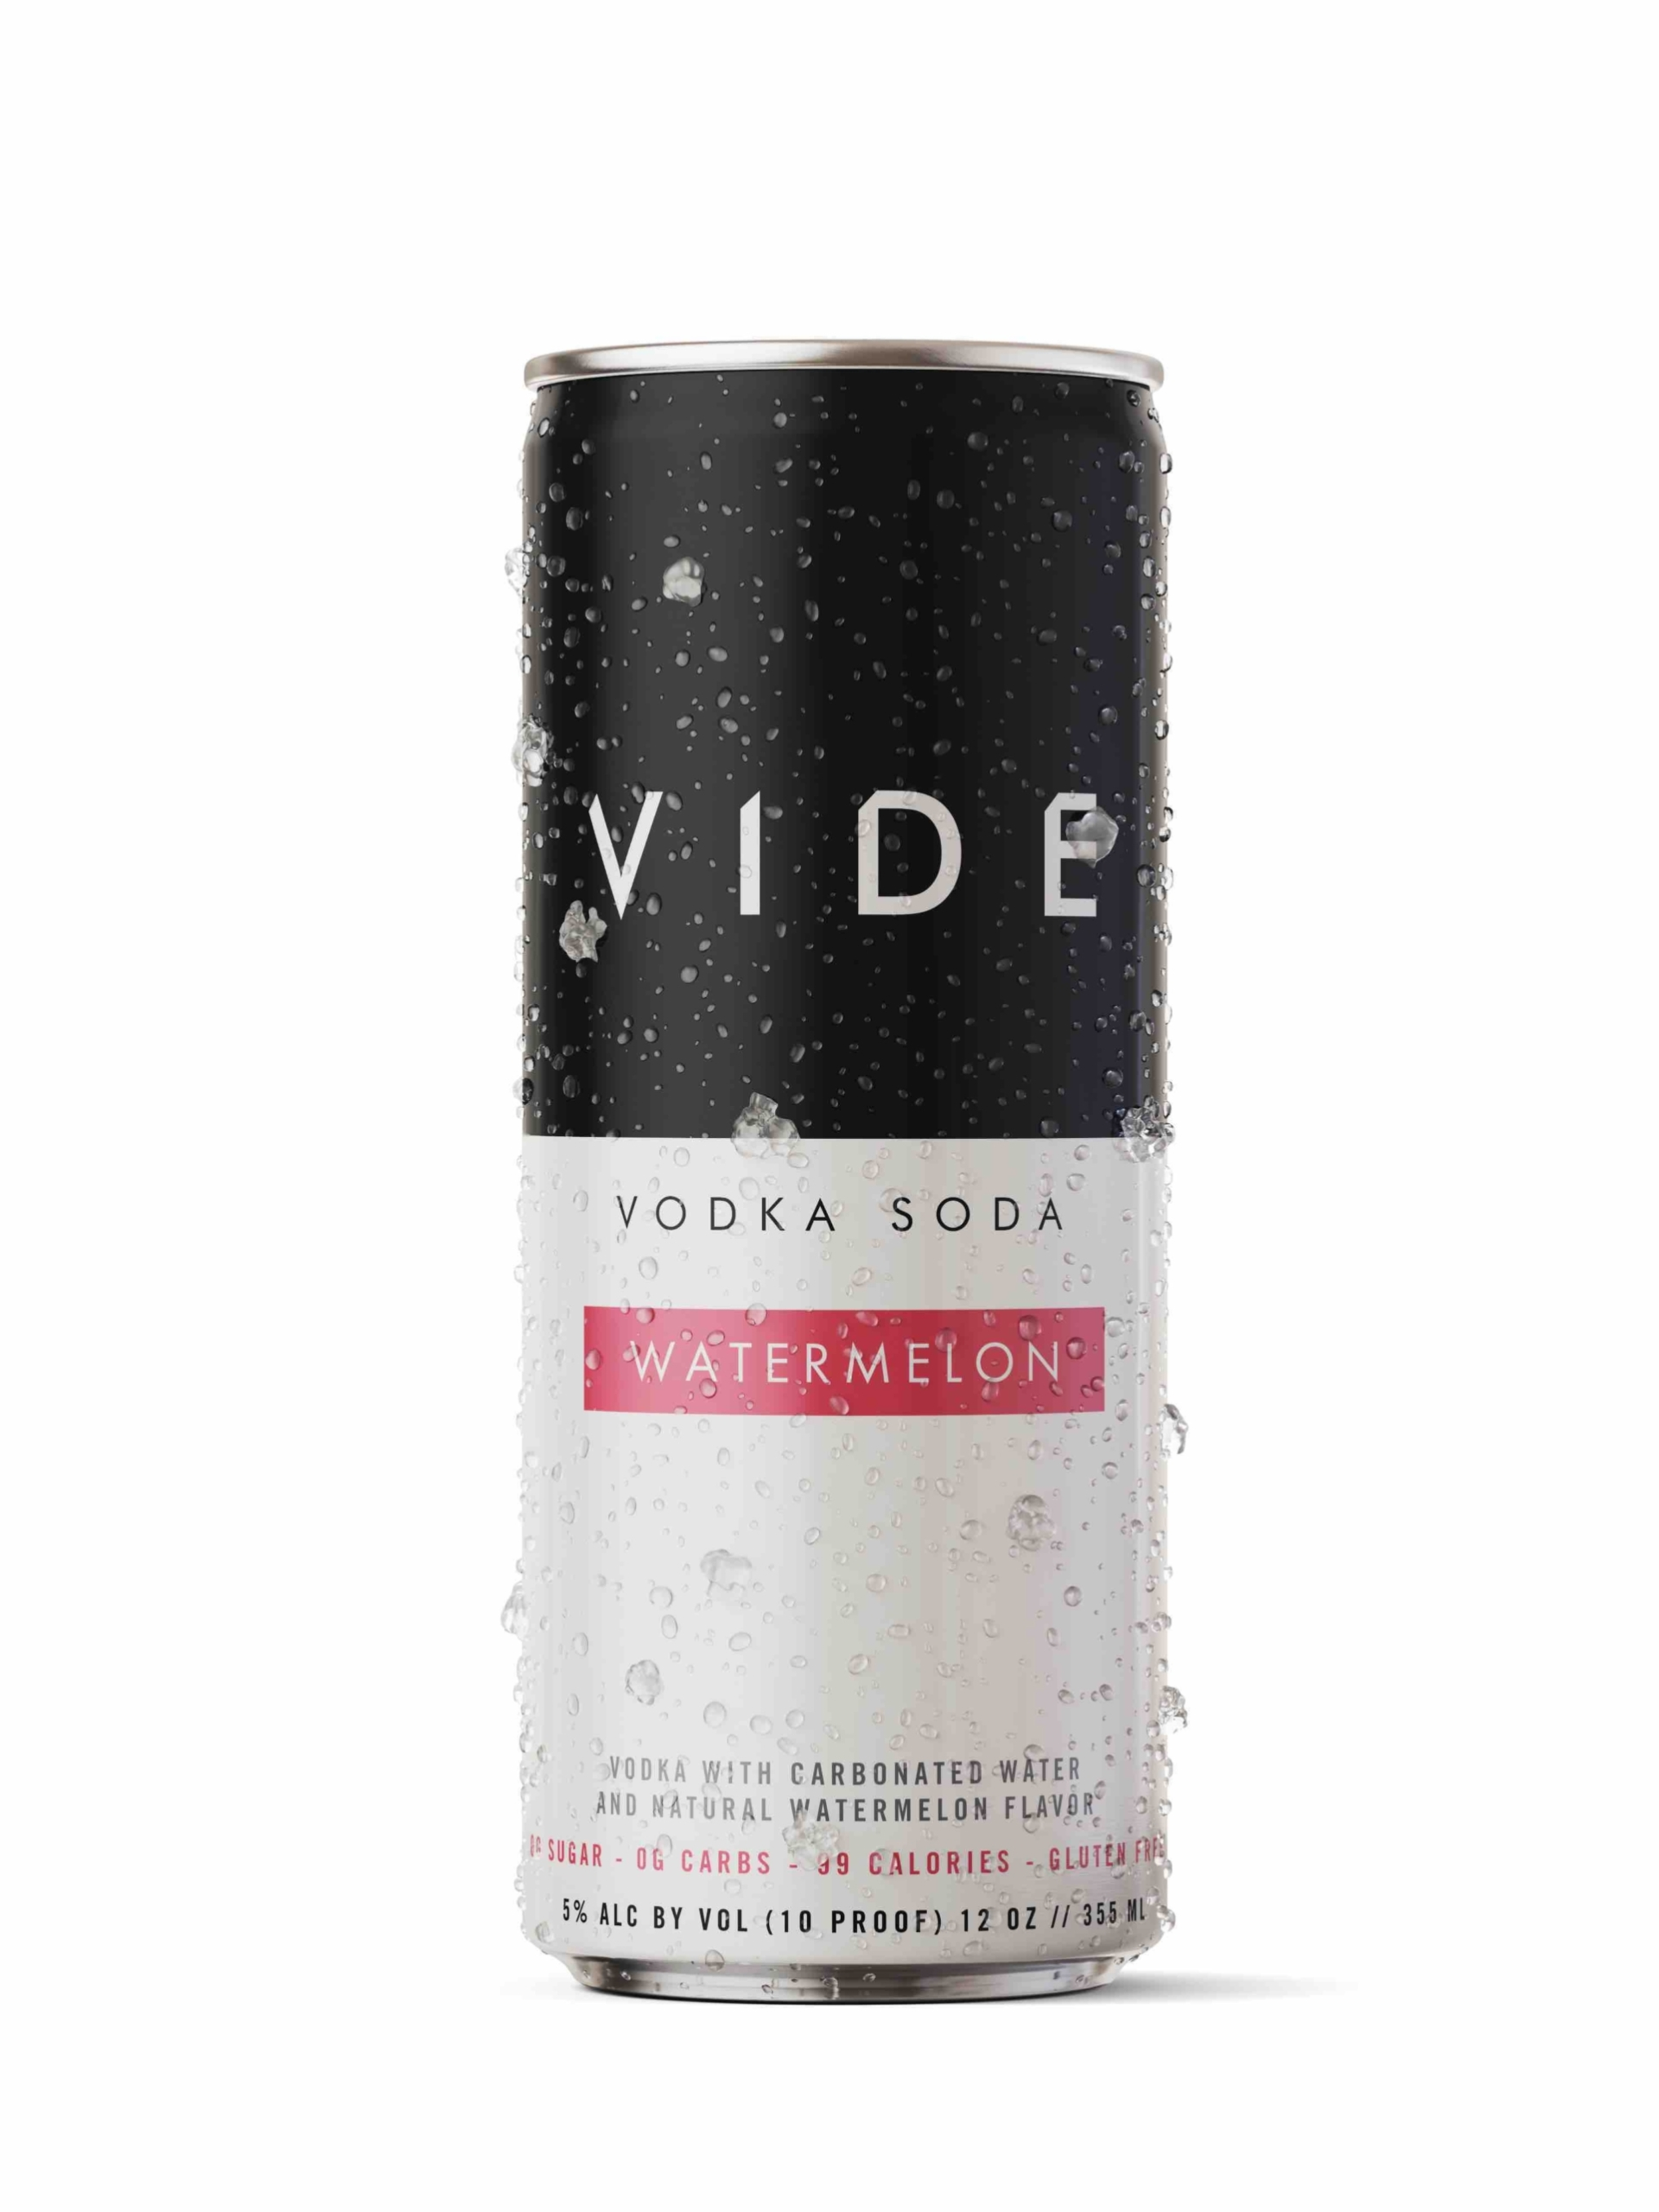 Vide Vodka Watermelon Soda